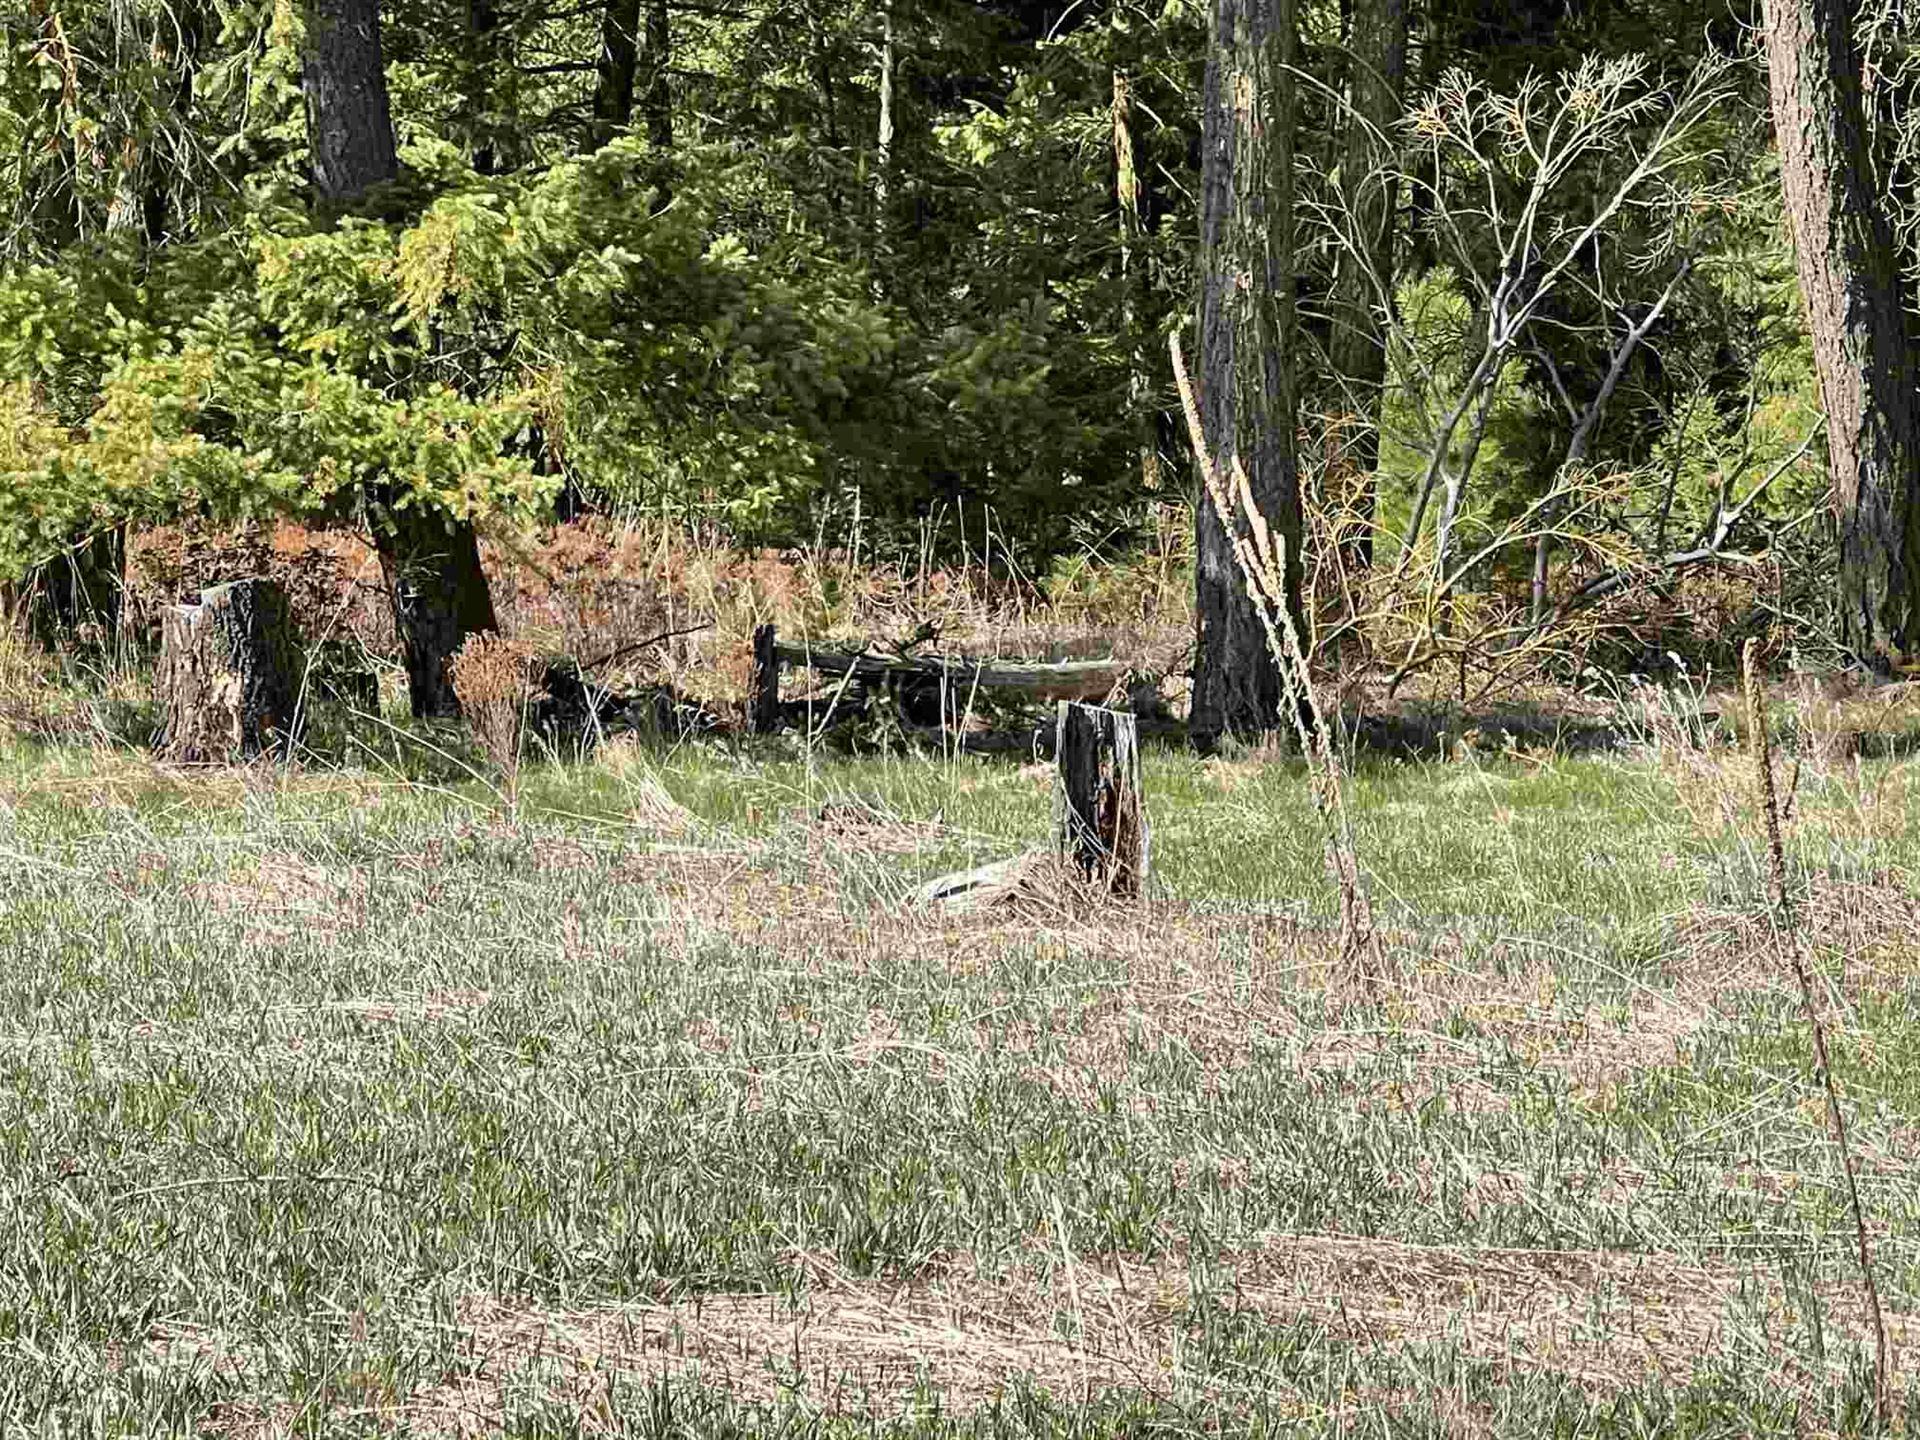 6XXX W Staley Rd #Parcel 7, Deer Park, WA 99006 - #: 202113808